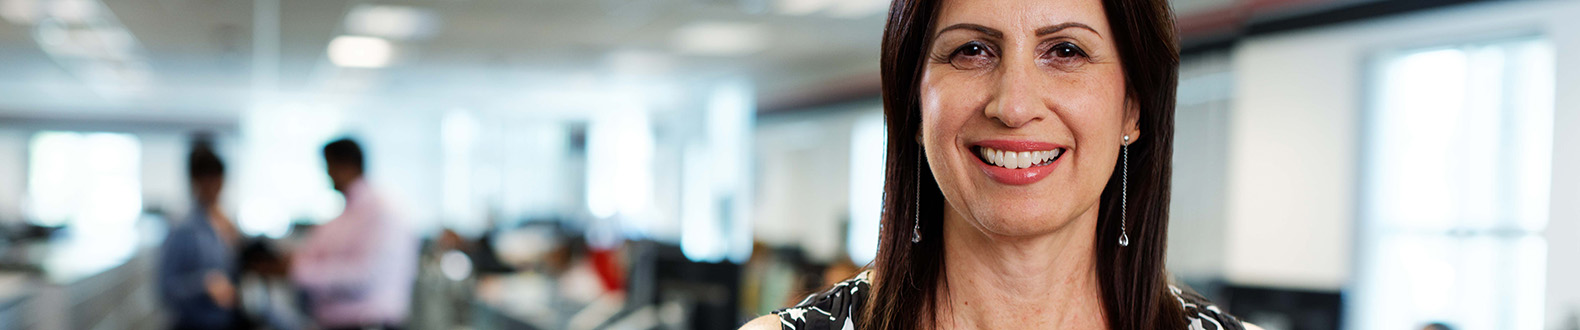 DB_Schenker_M12_Professional-White-Collar-Female_Office-data